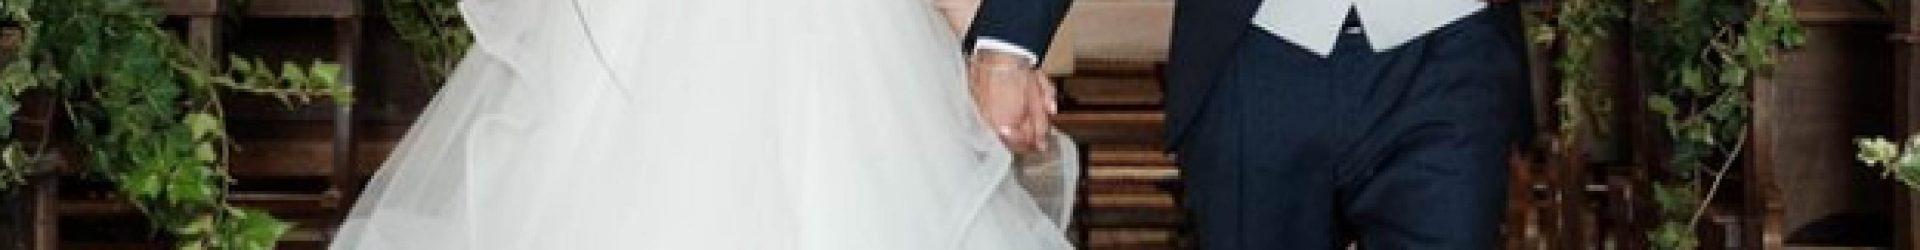 Francesca e Cesare matrimonio